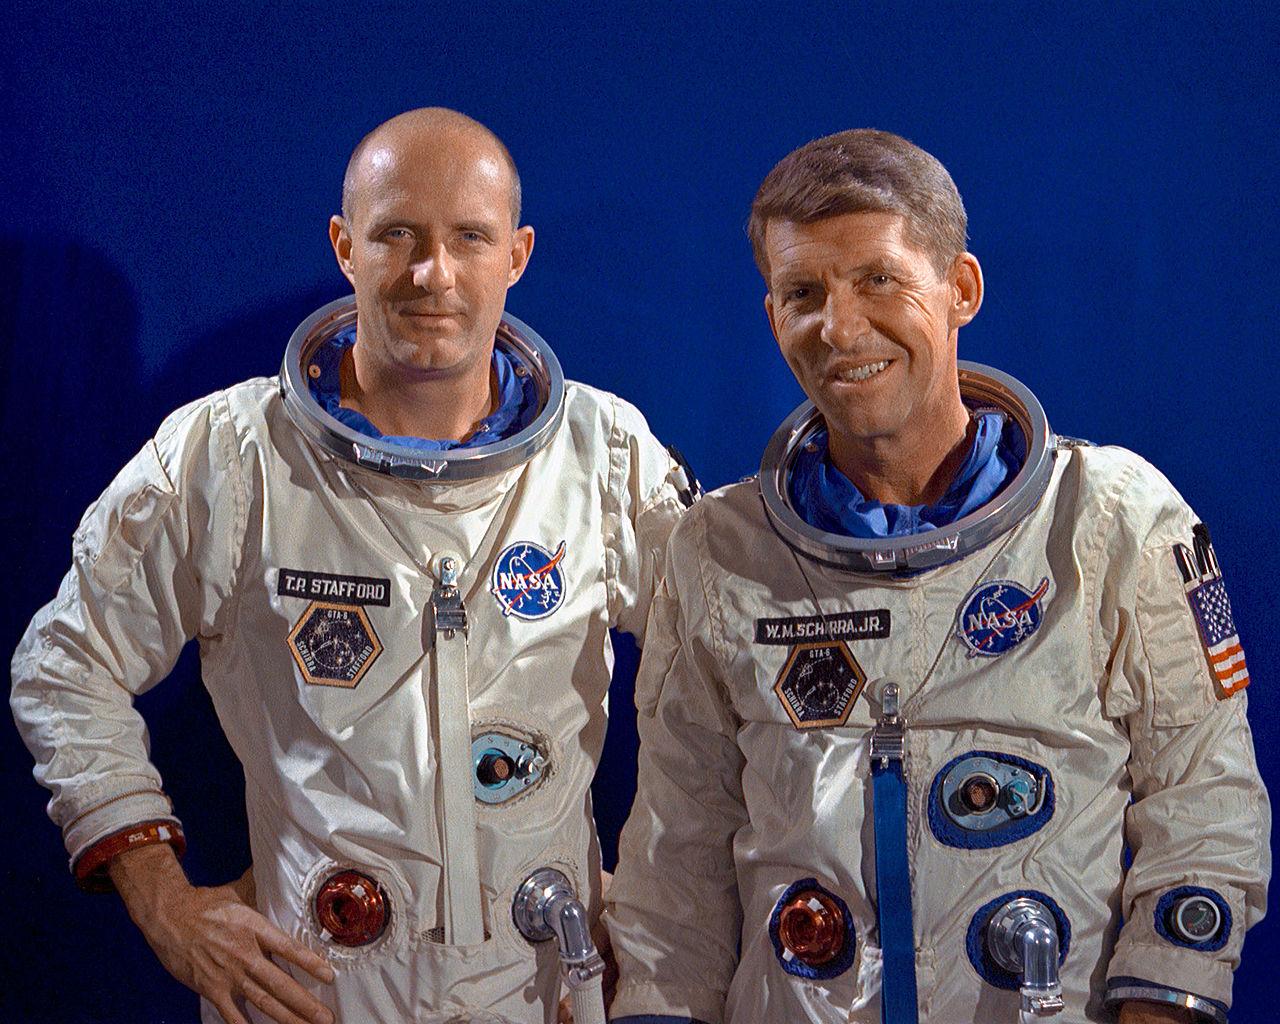 Thomas Stafford (L) and Walter Schirra (R)